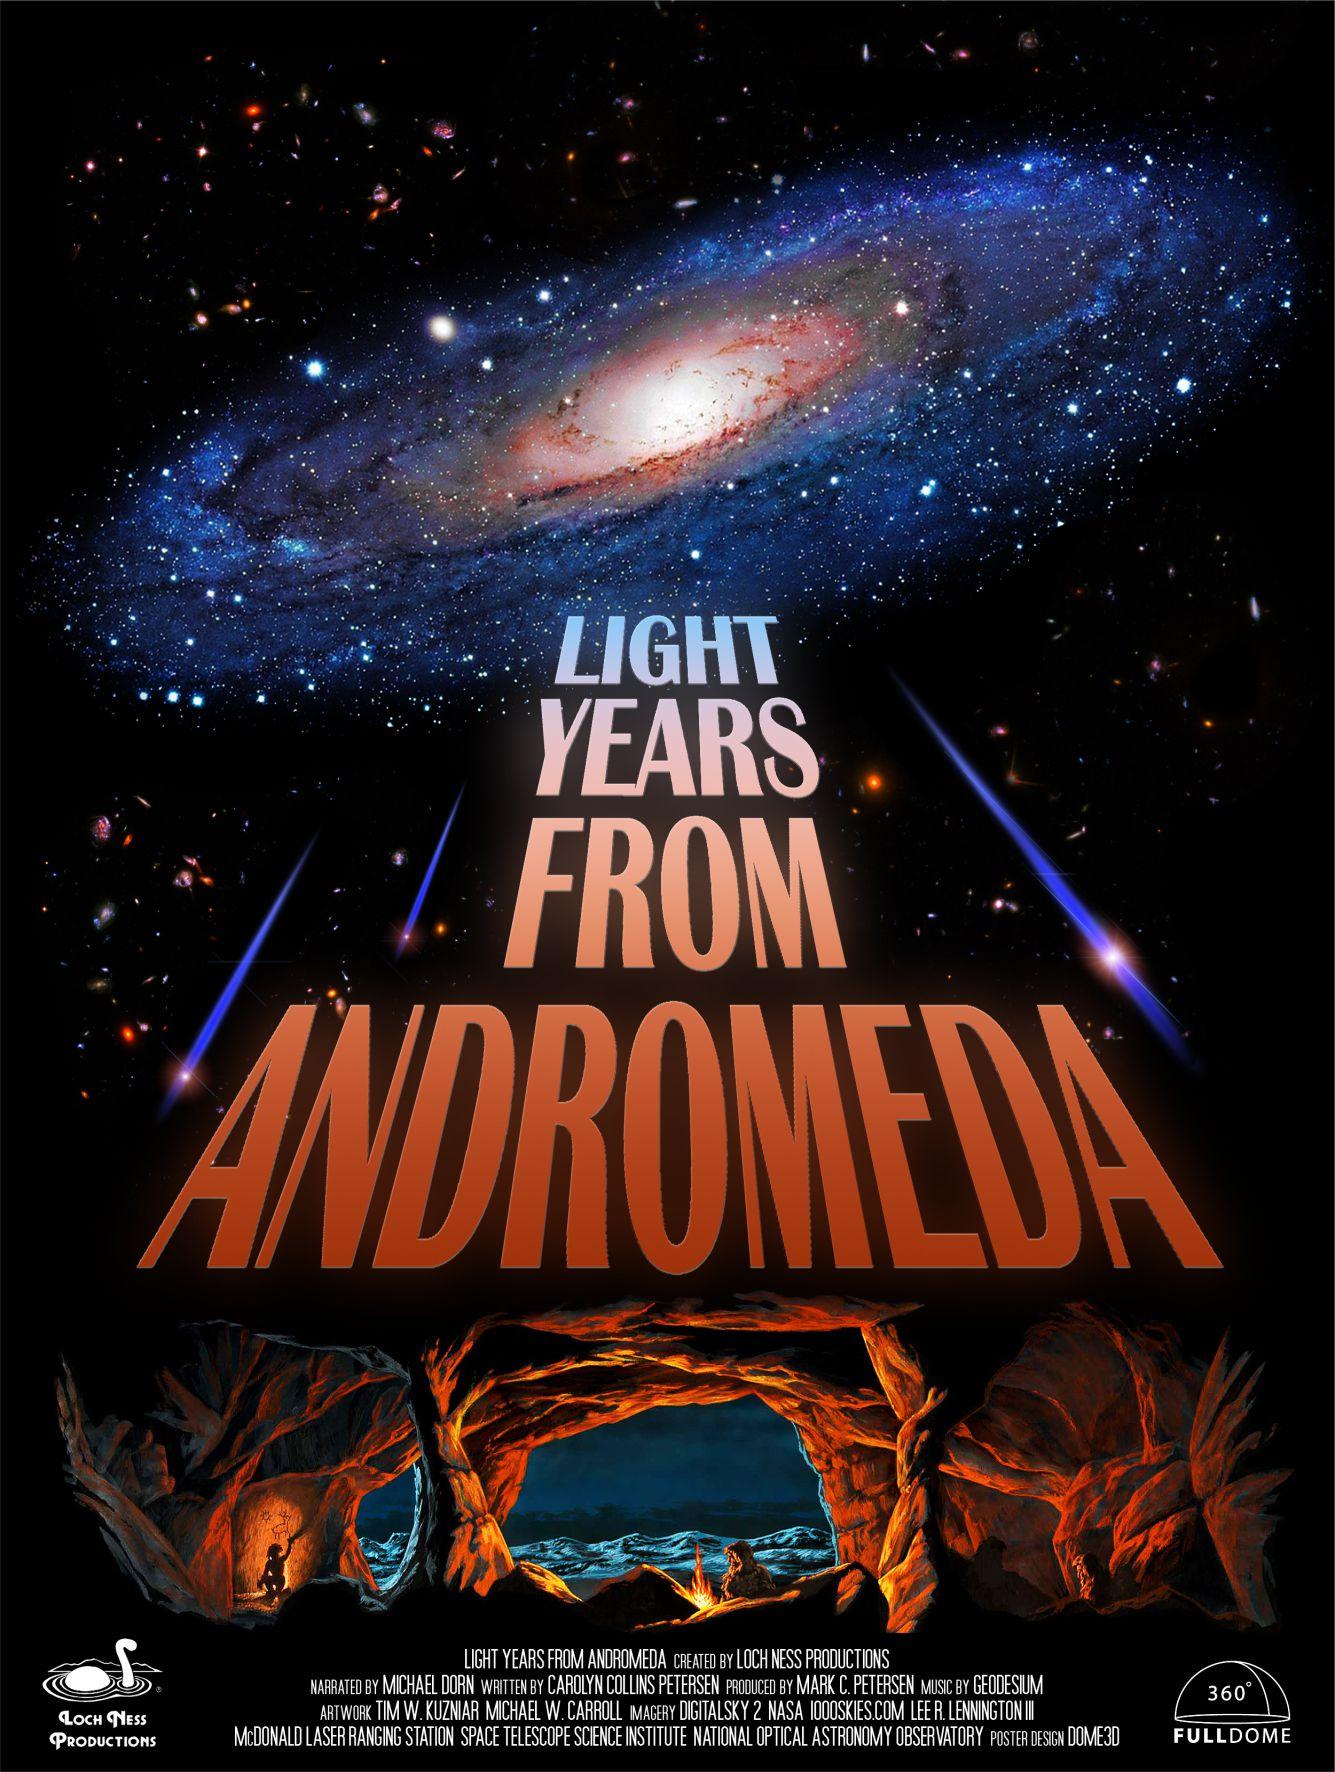 Lata świetlne od Andromedy – EN / 2D